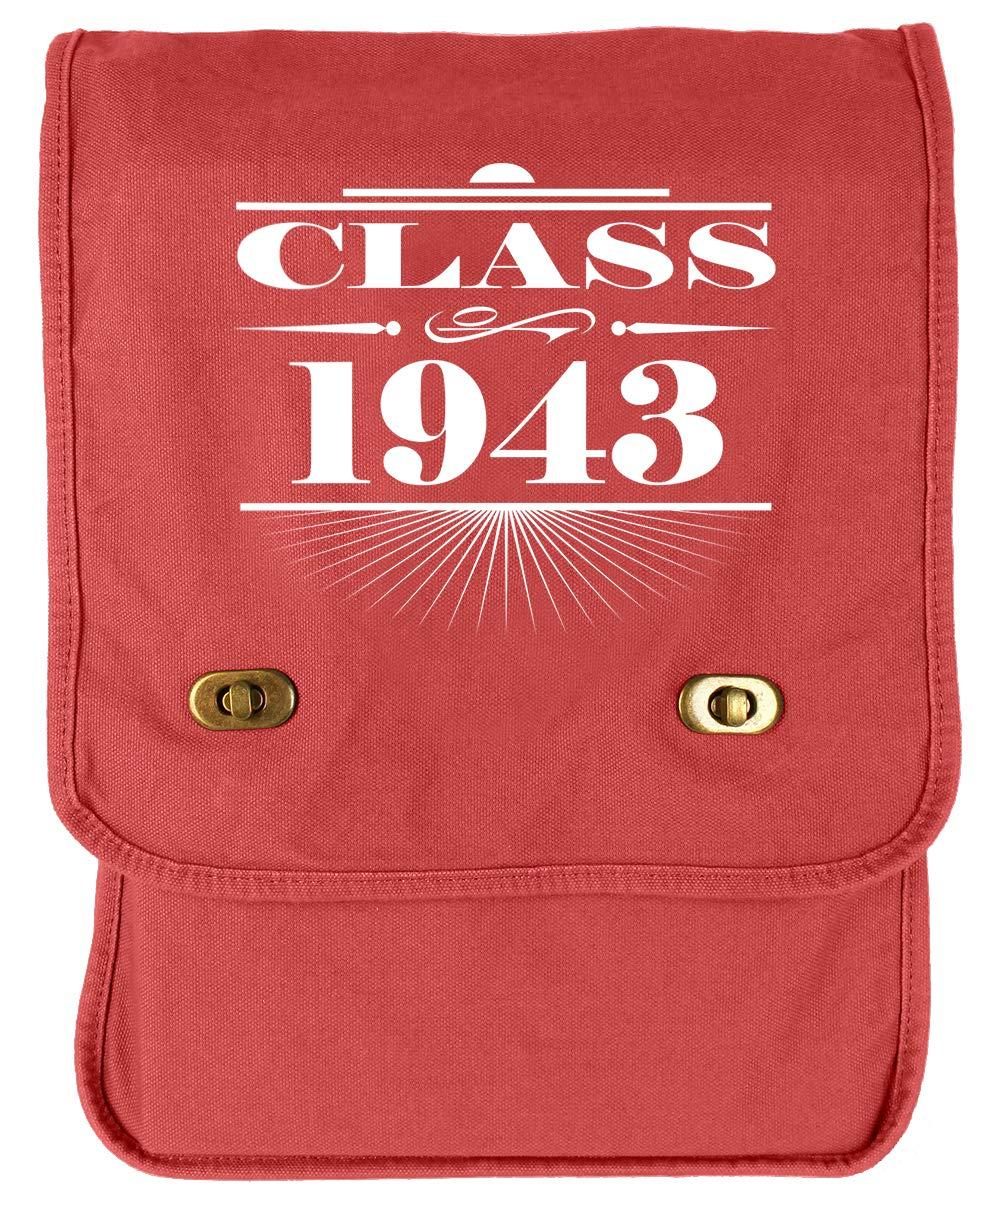 Tenacitee Art Deco Class of 1943 Royal Blue Brushed Canvas Messenger Bag